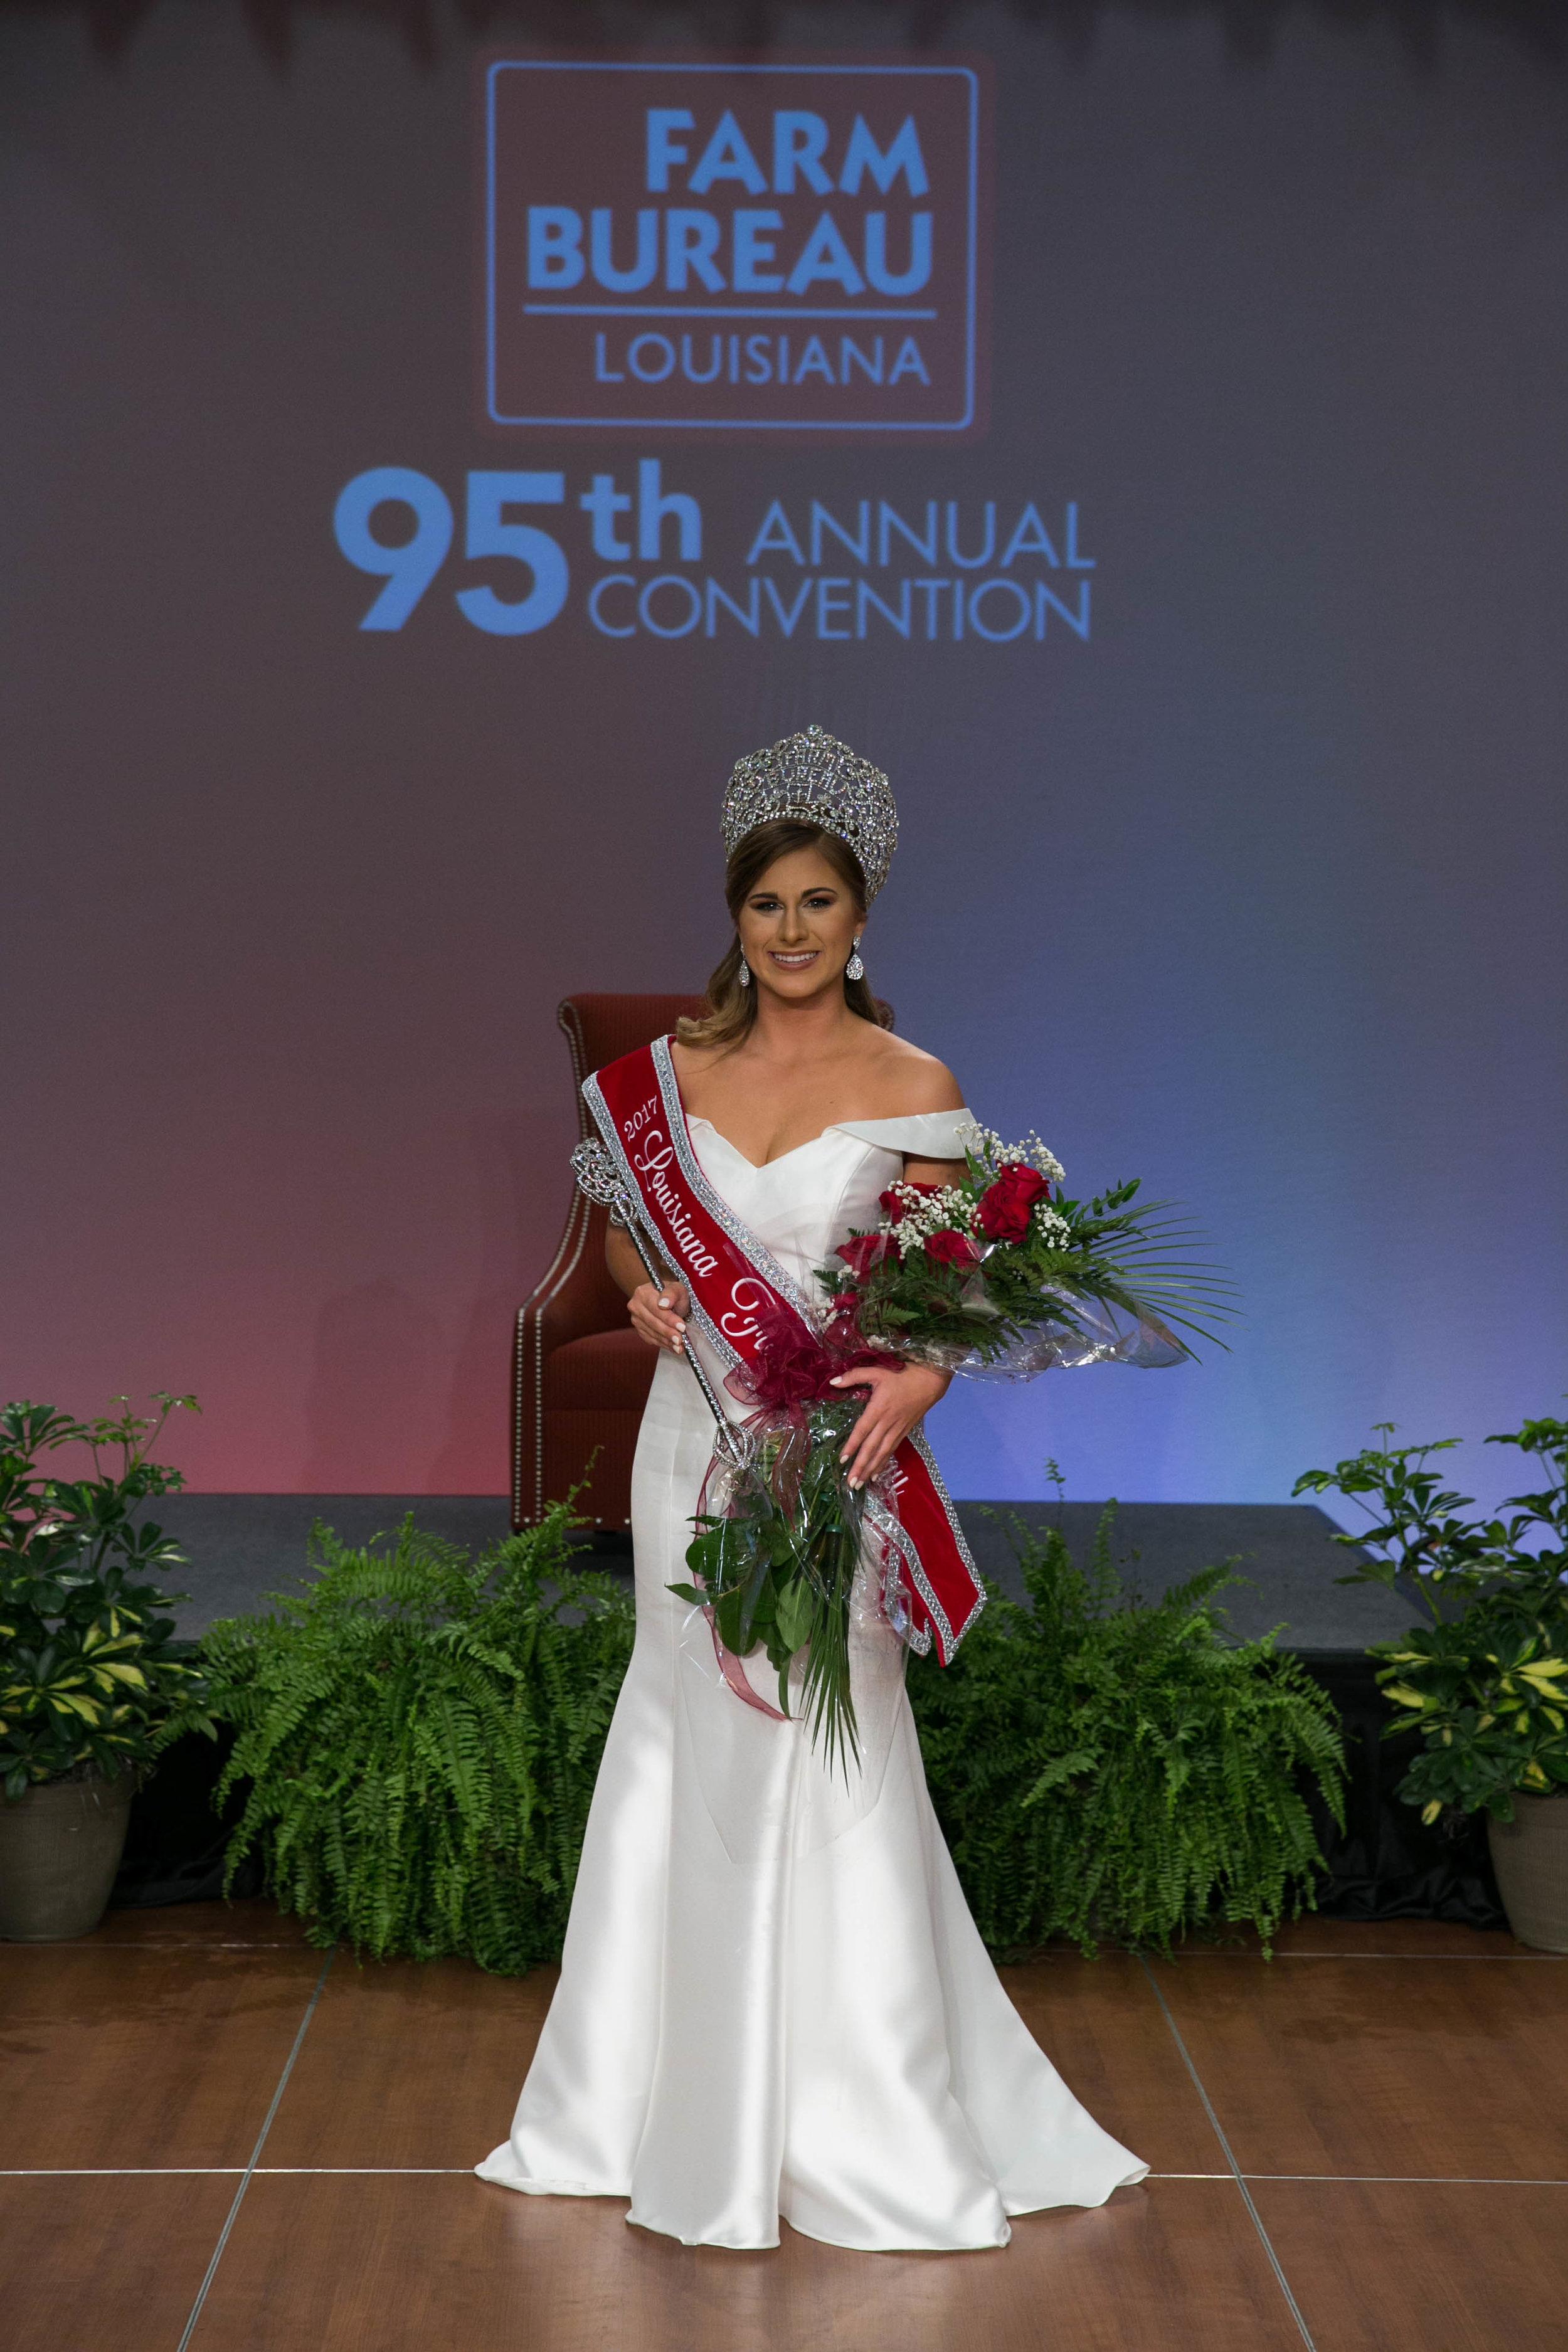 Sloane Judice, 16, of Iberia parish was crowned the 2017 Louisiana Farm Bureau Queen Saturday night during the organization's 95th annual convention.